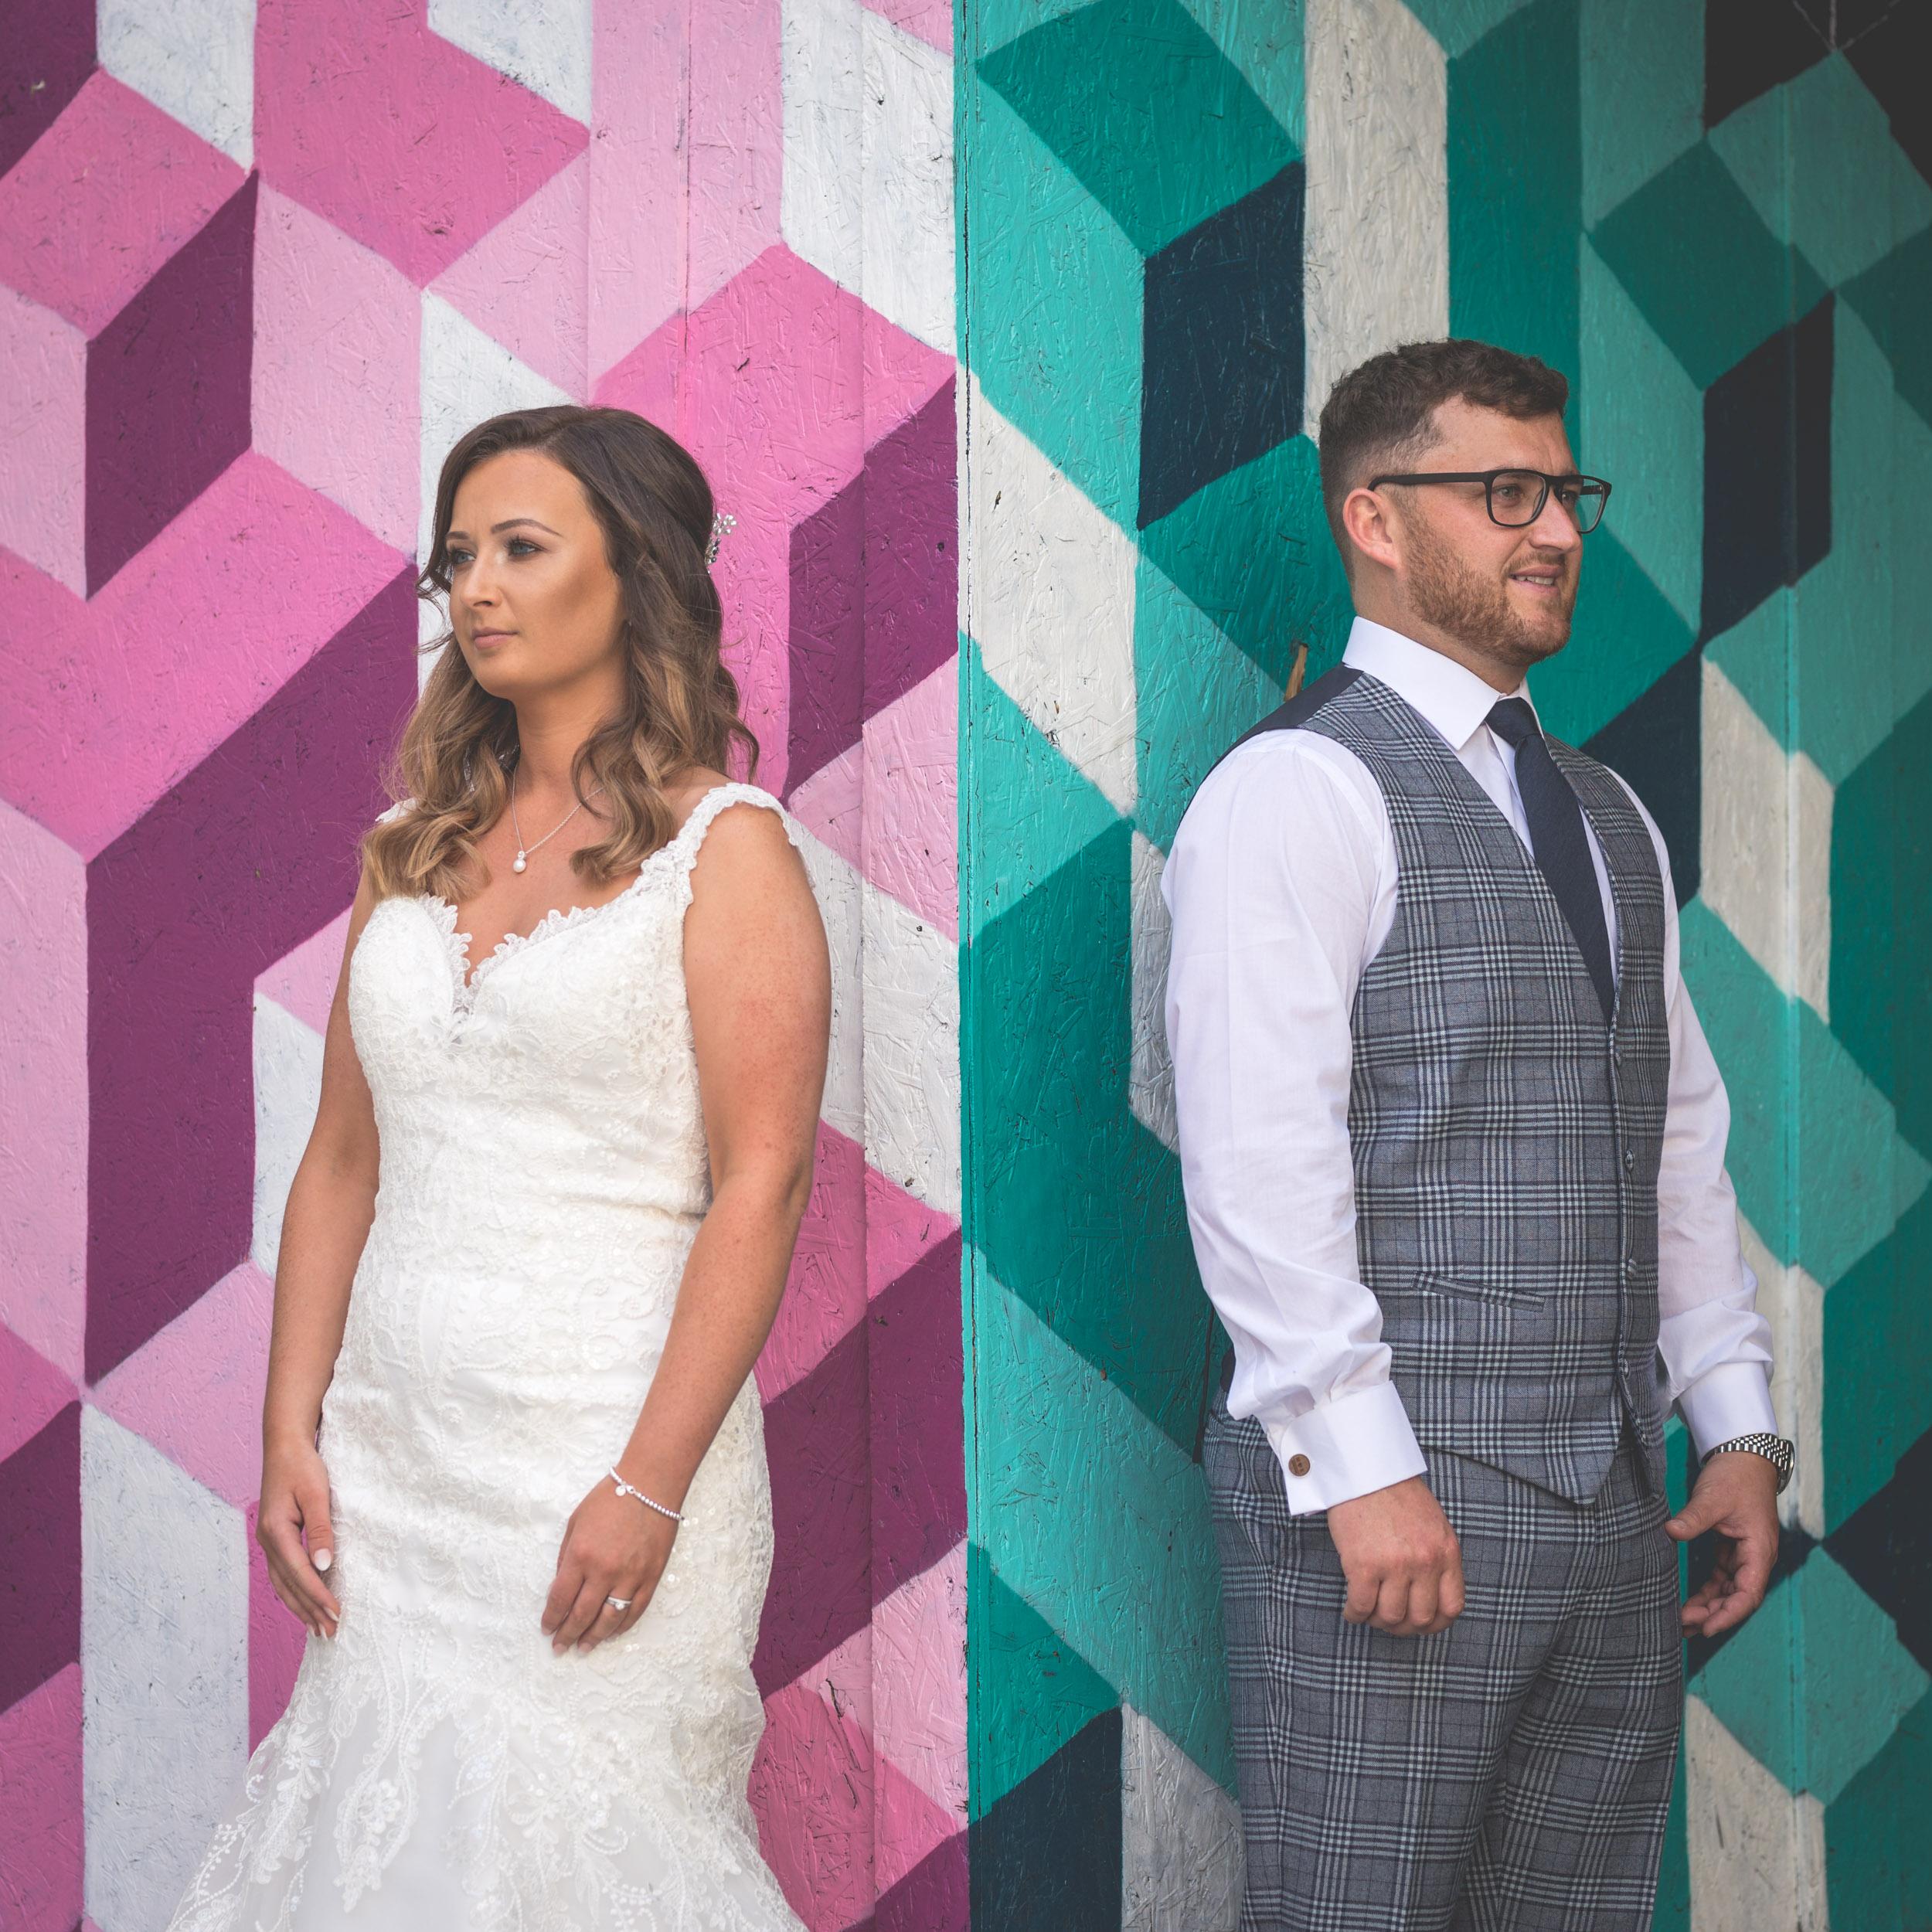 Brian McEwan   Northern Ireland Wedding Photographer   Rebecca & Michael   Portraits-92.jpg